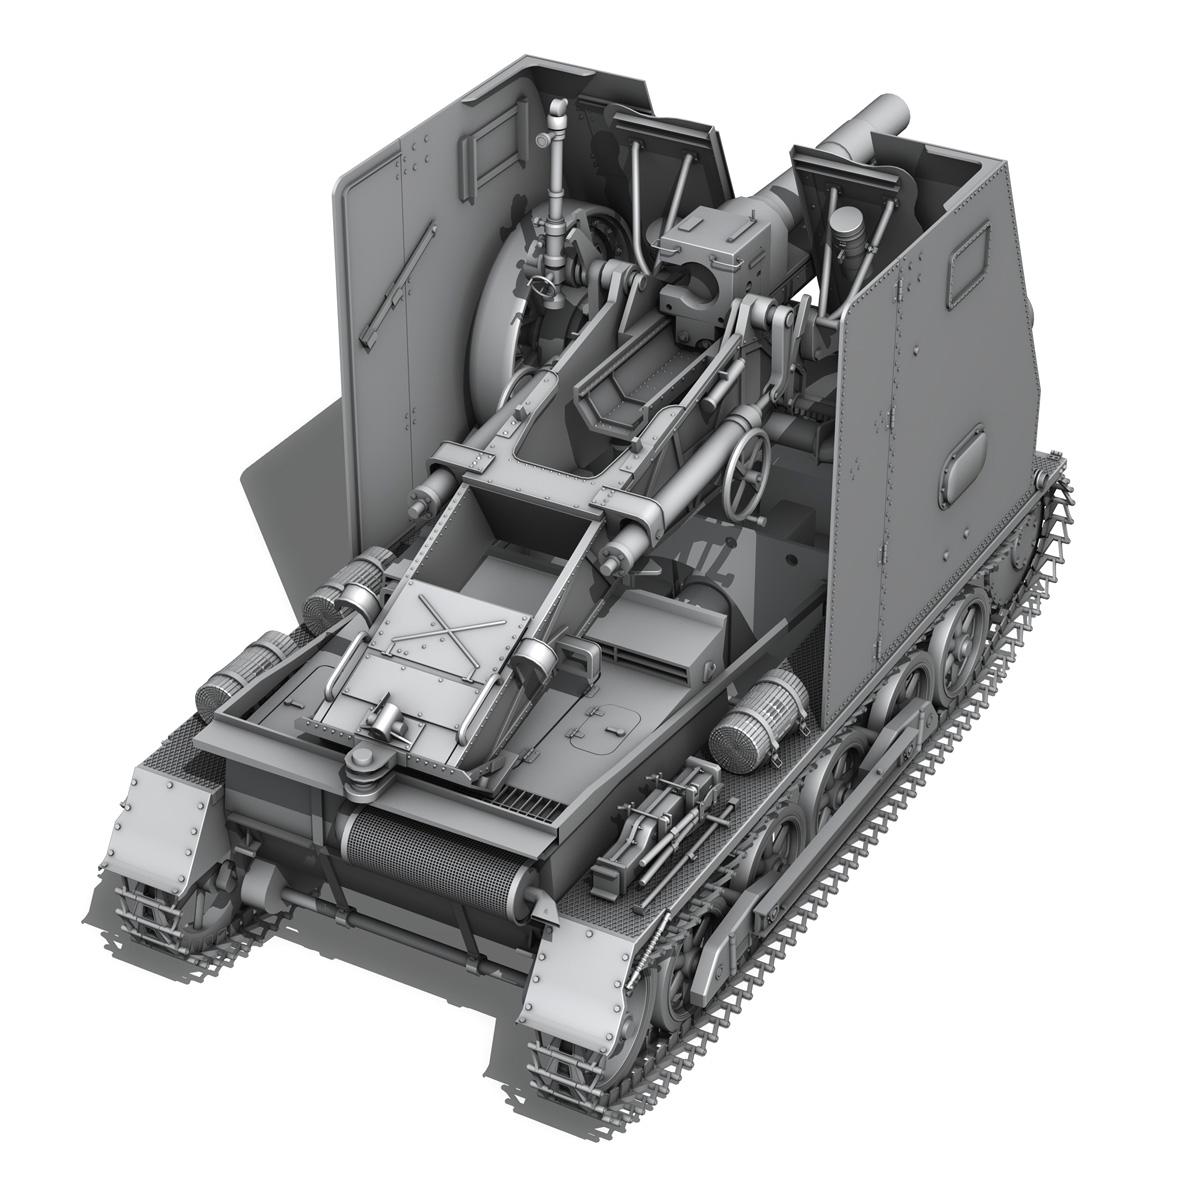 sd.kfz 101 – sturmpanzer 1 – bison 3d model 3ds fbx c4d lwo obj 189274